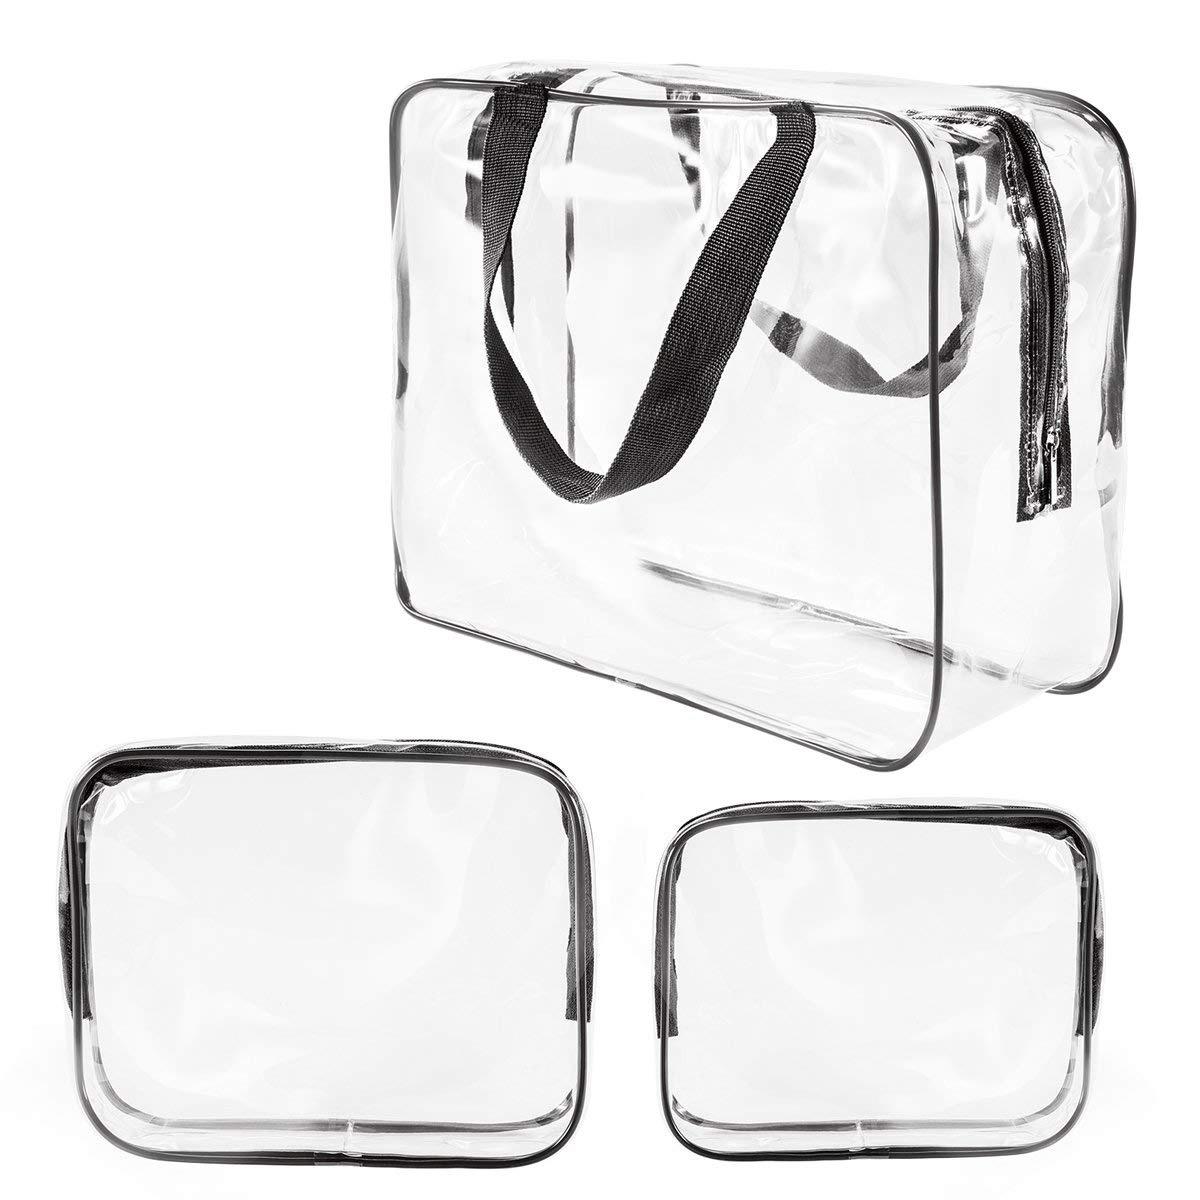 1010a8c9c58a 3Pcs Crystal Clear Cosmetic Bag TSA Air Travel Toiletry Bag Set with Zipper  Vinyl PVC Make-up Pouch Handle Straps for Women Men